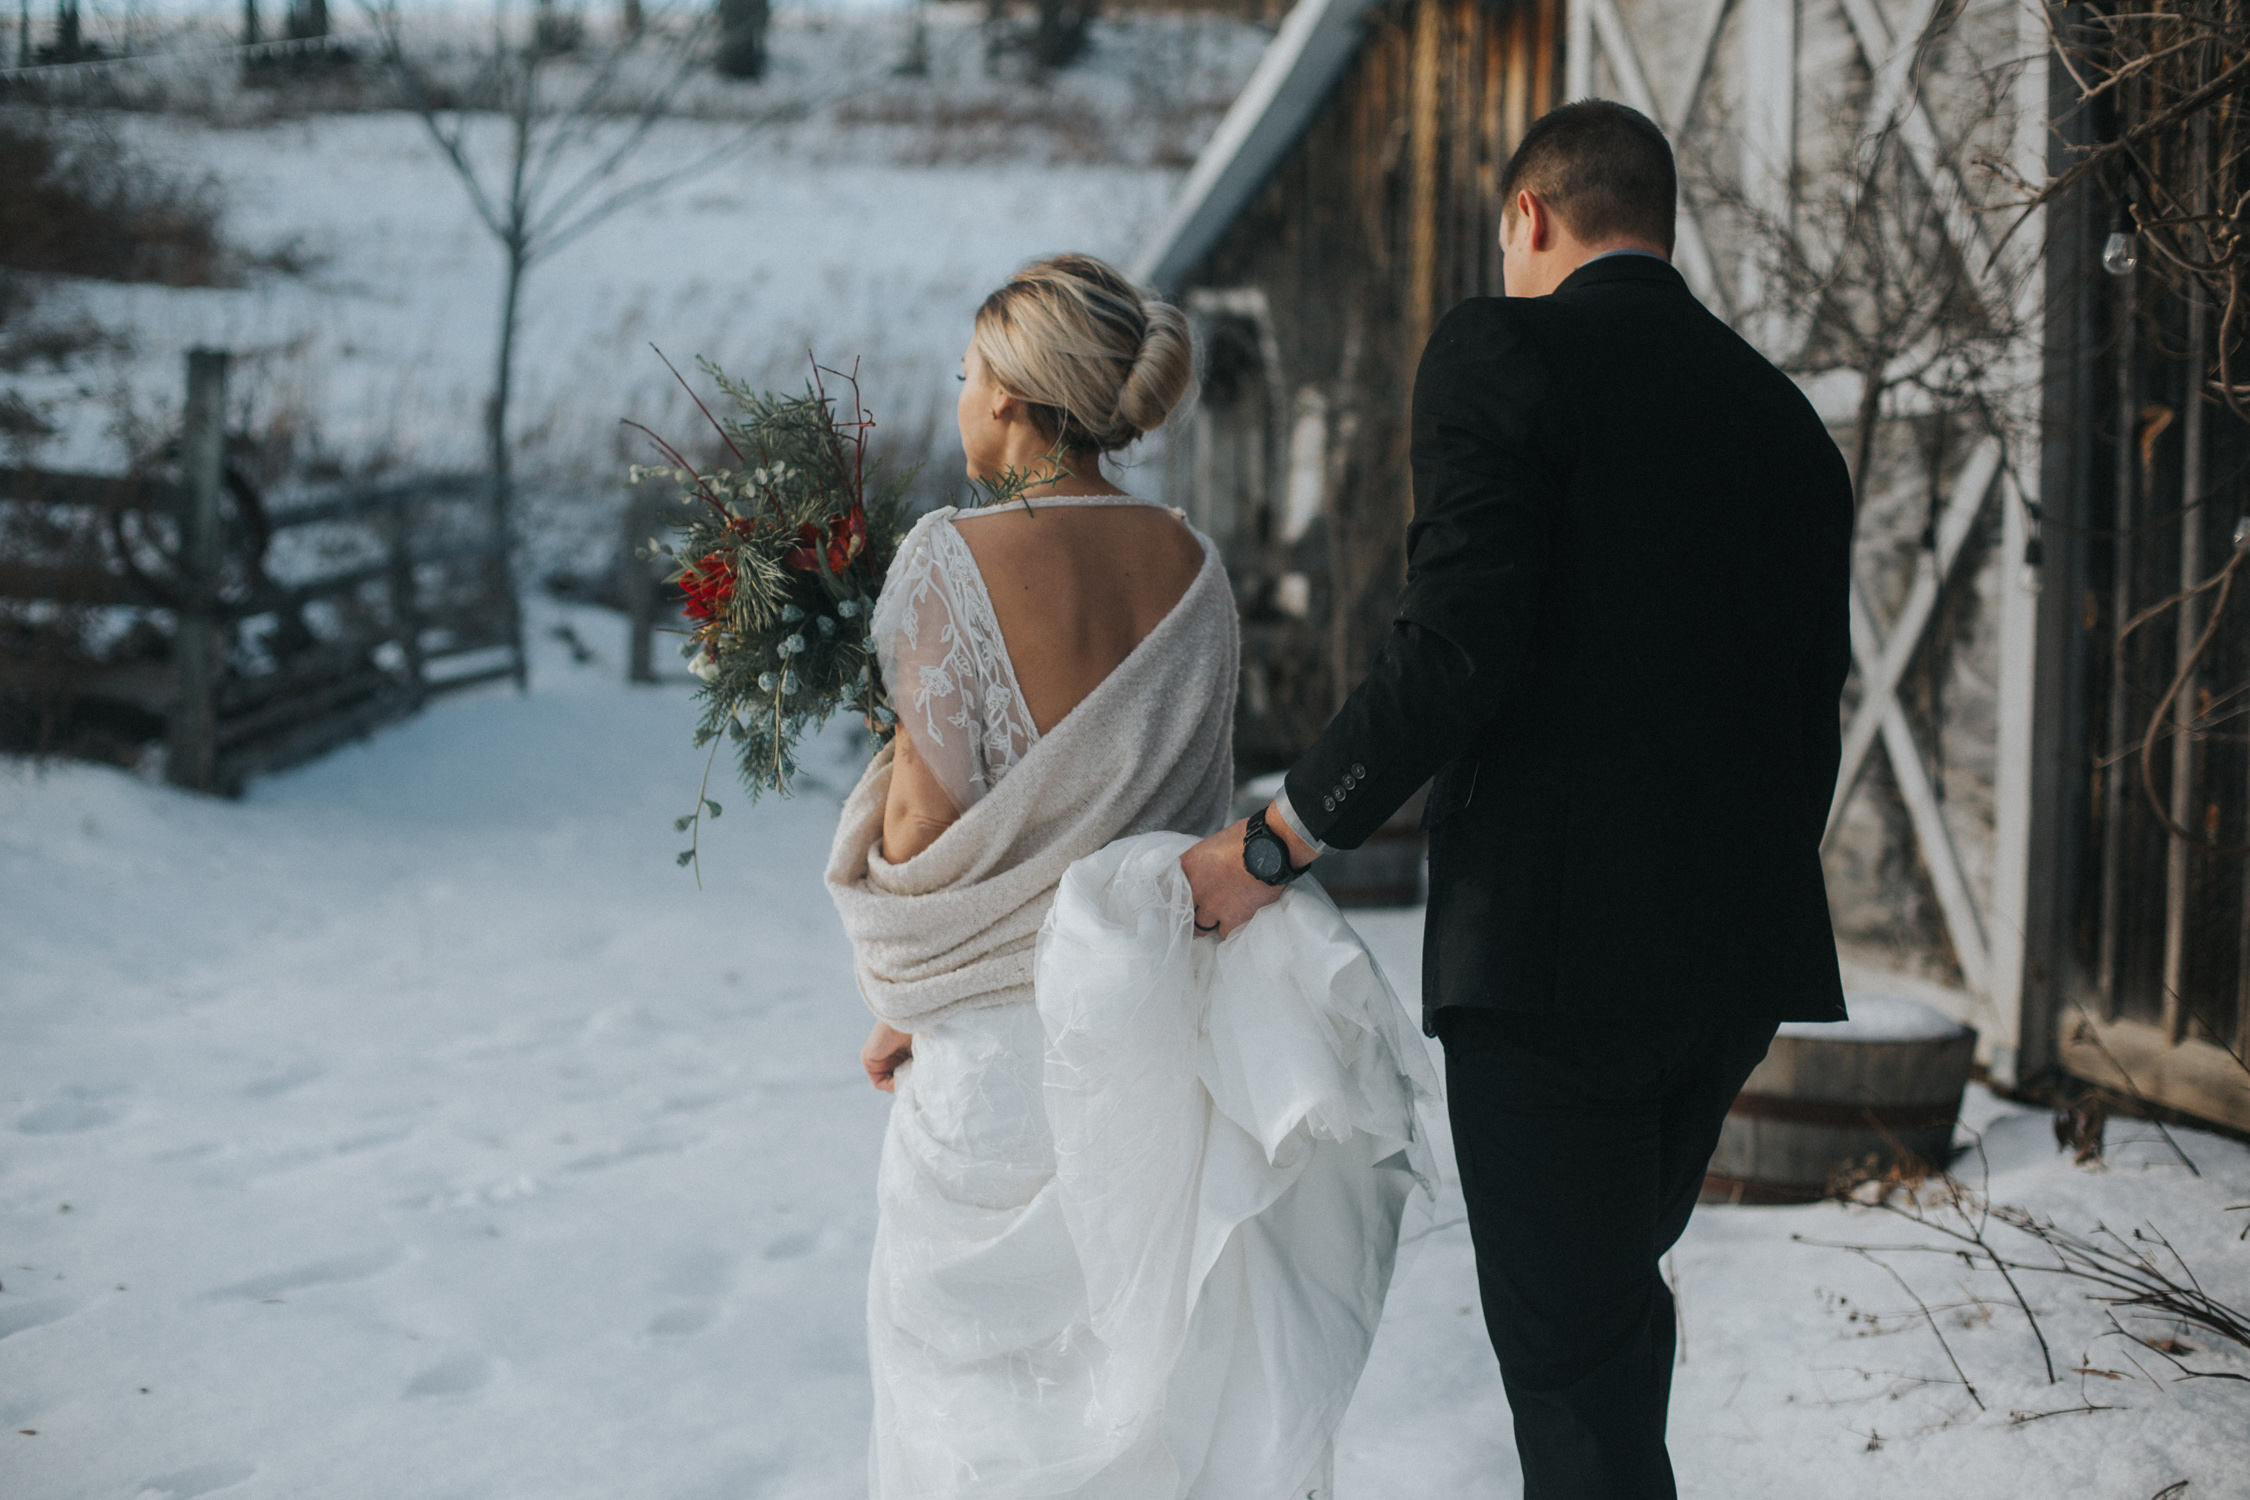 mnd_farm_winter_wedding_003.jpg